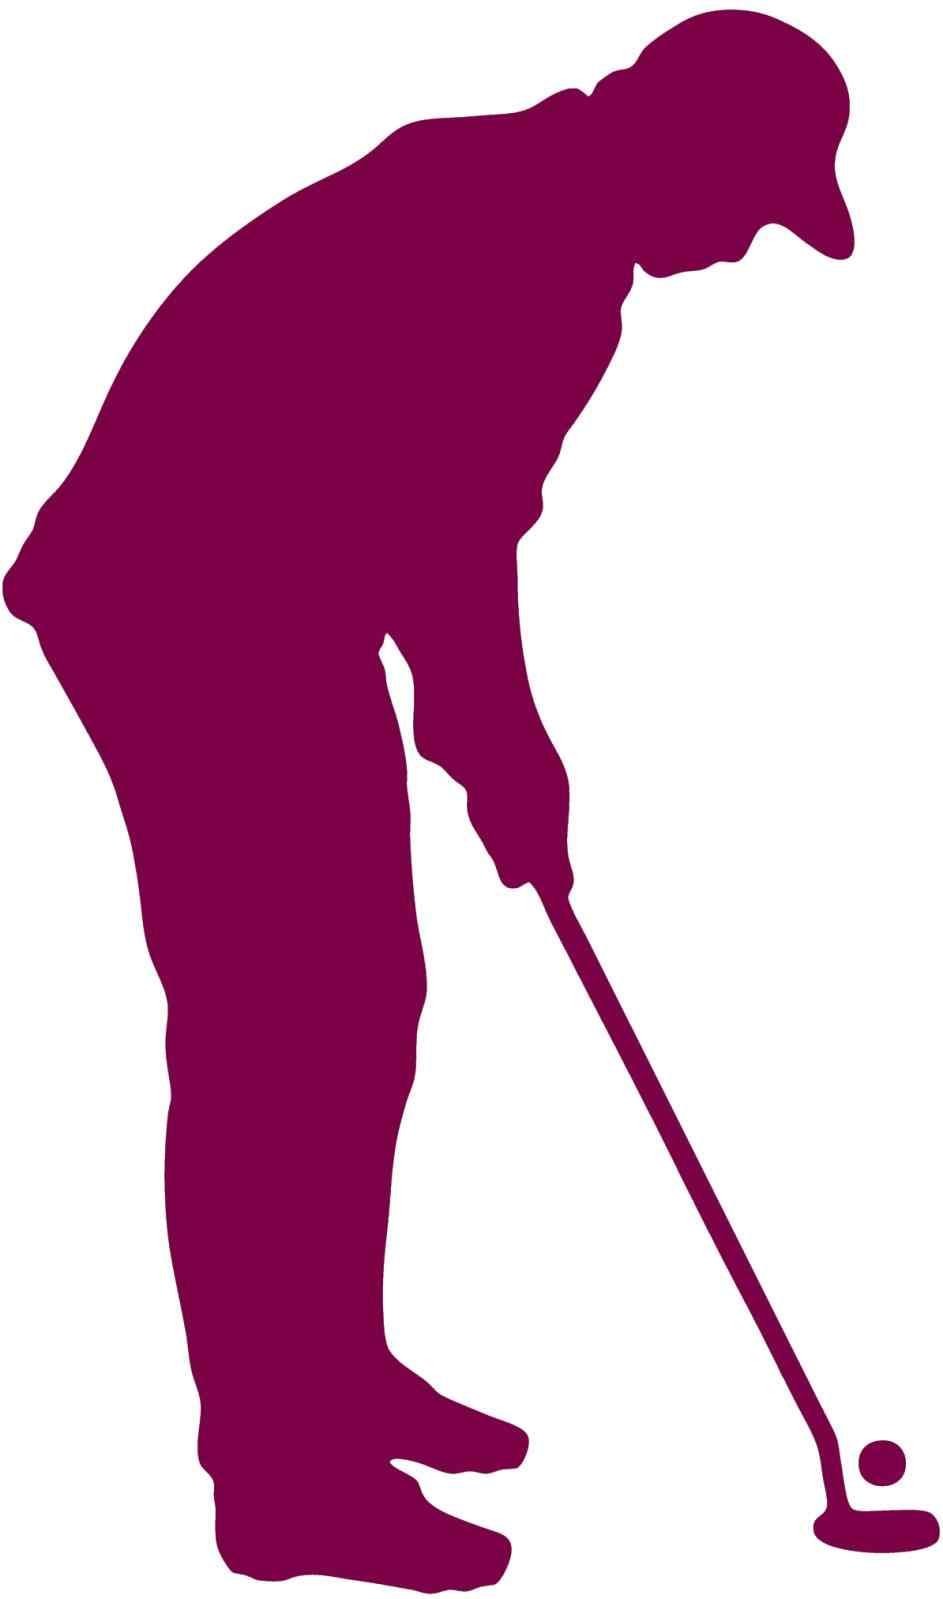 943x1599 Golf Silhouette Borisimage.club